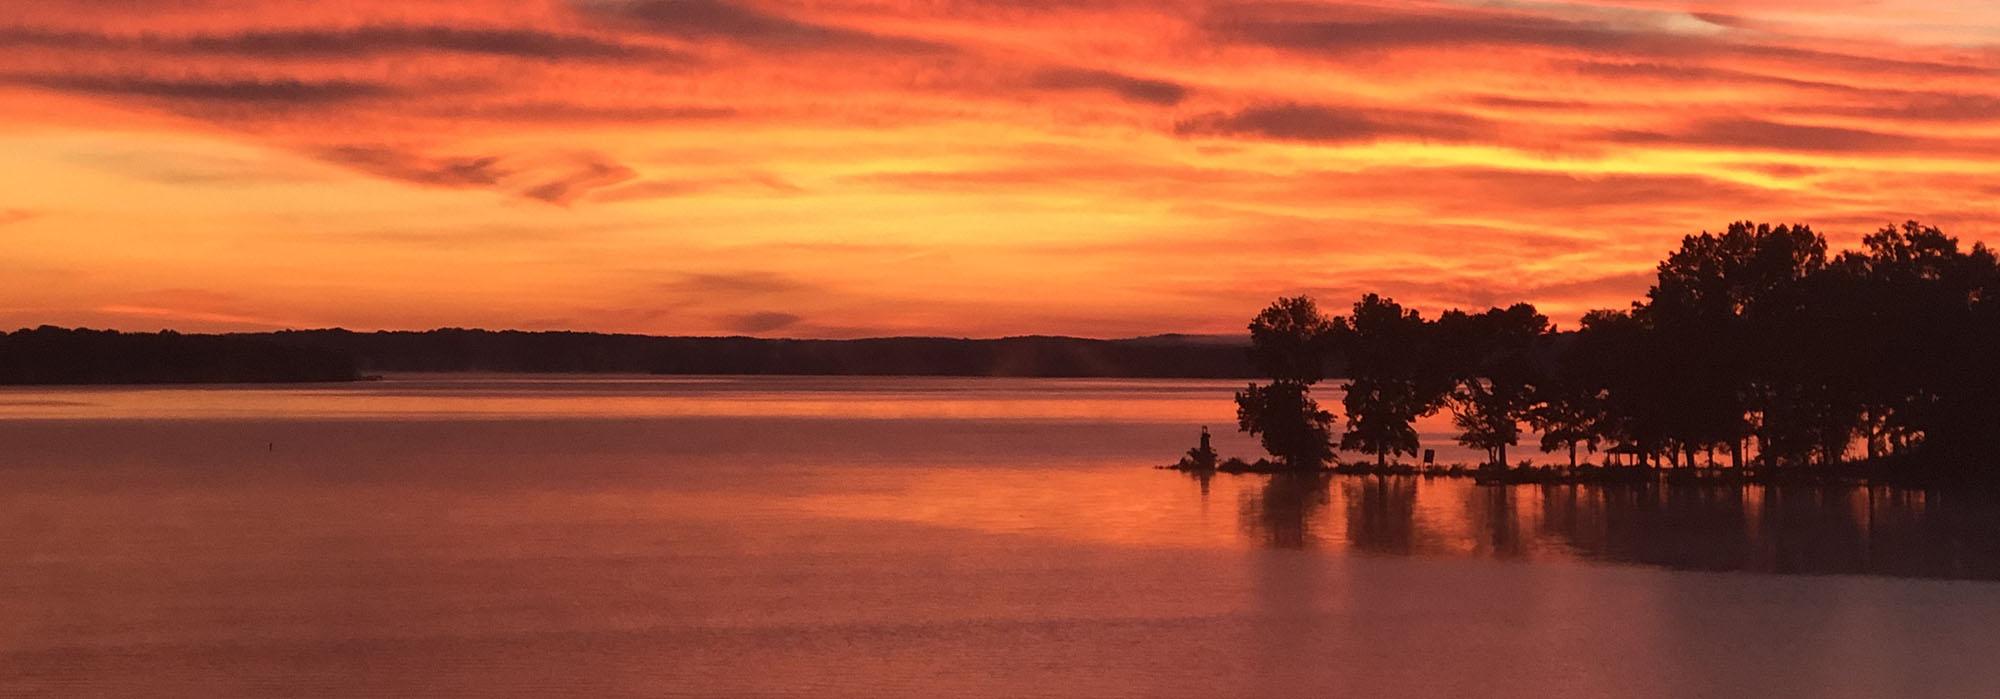 LakeWatereeSunset